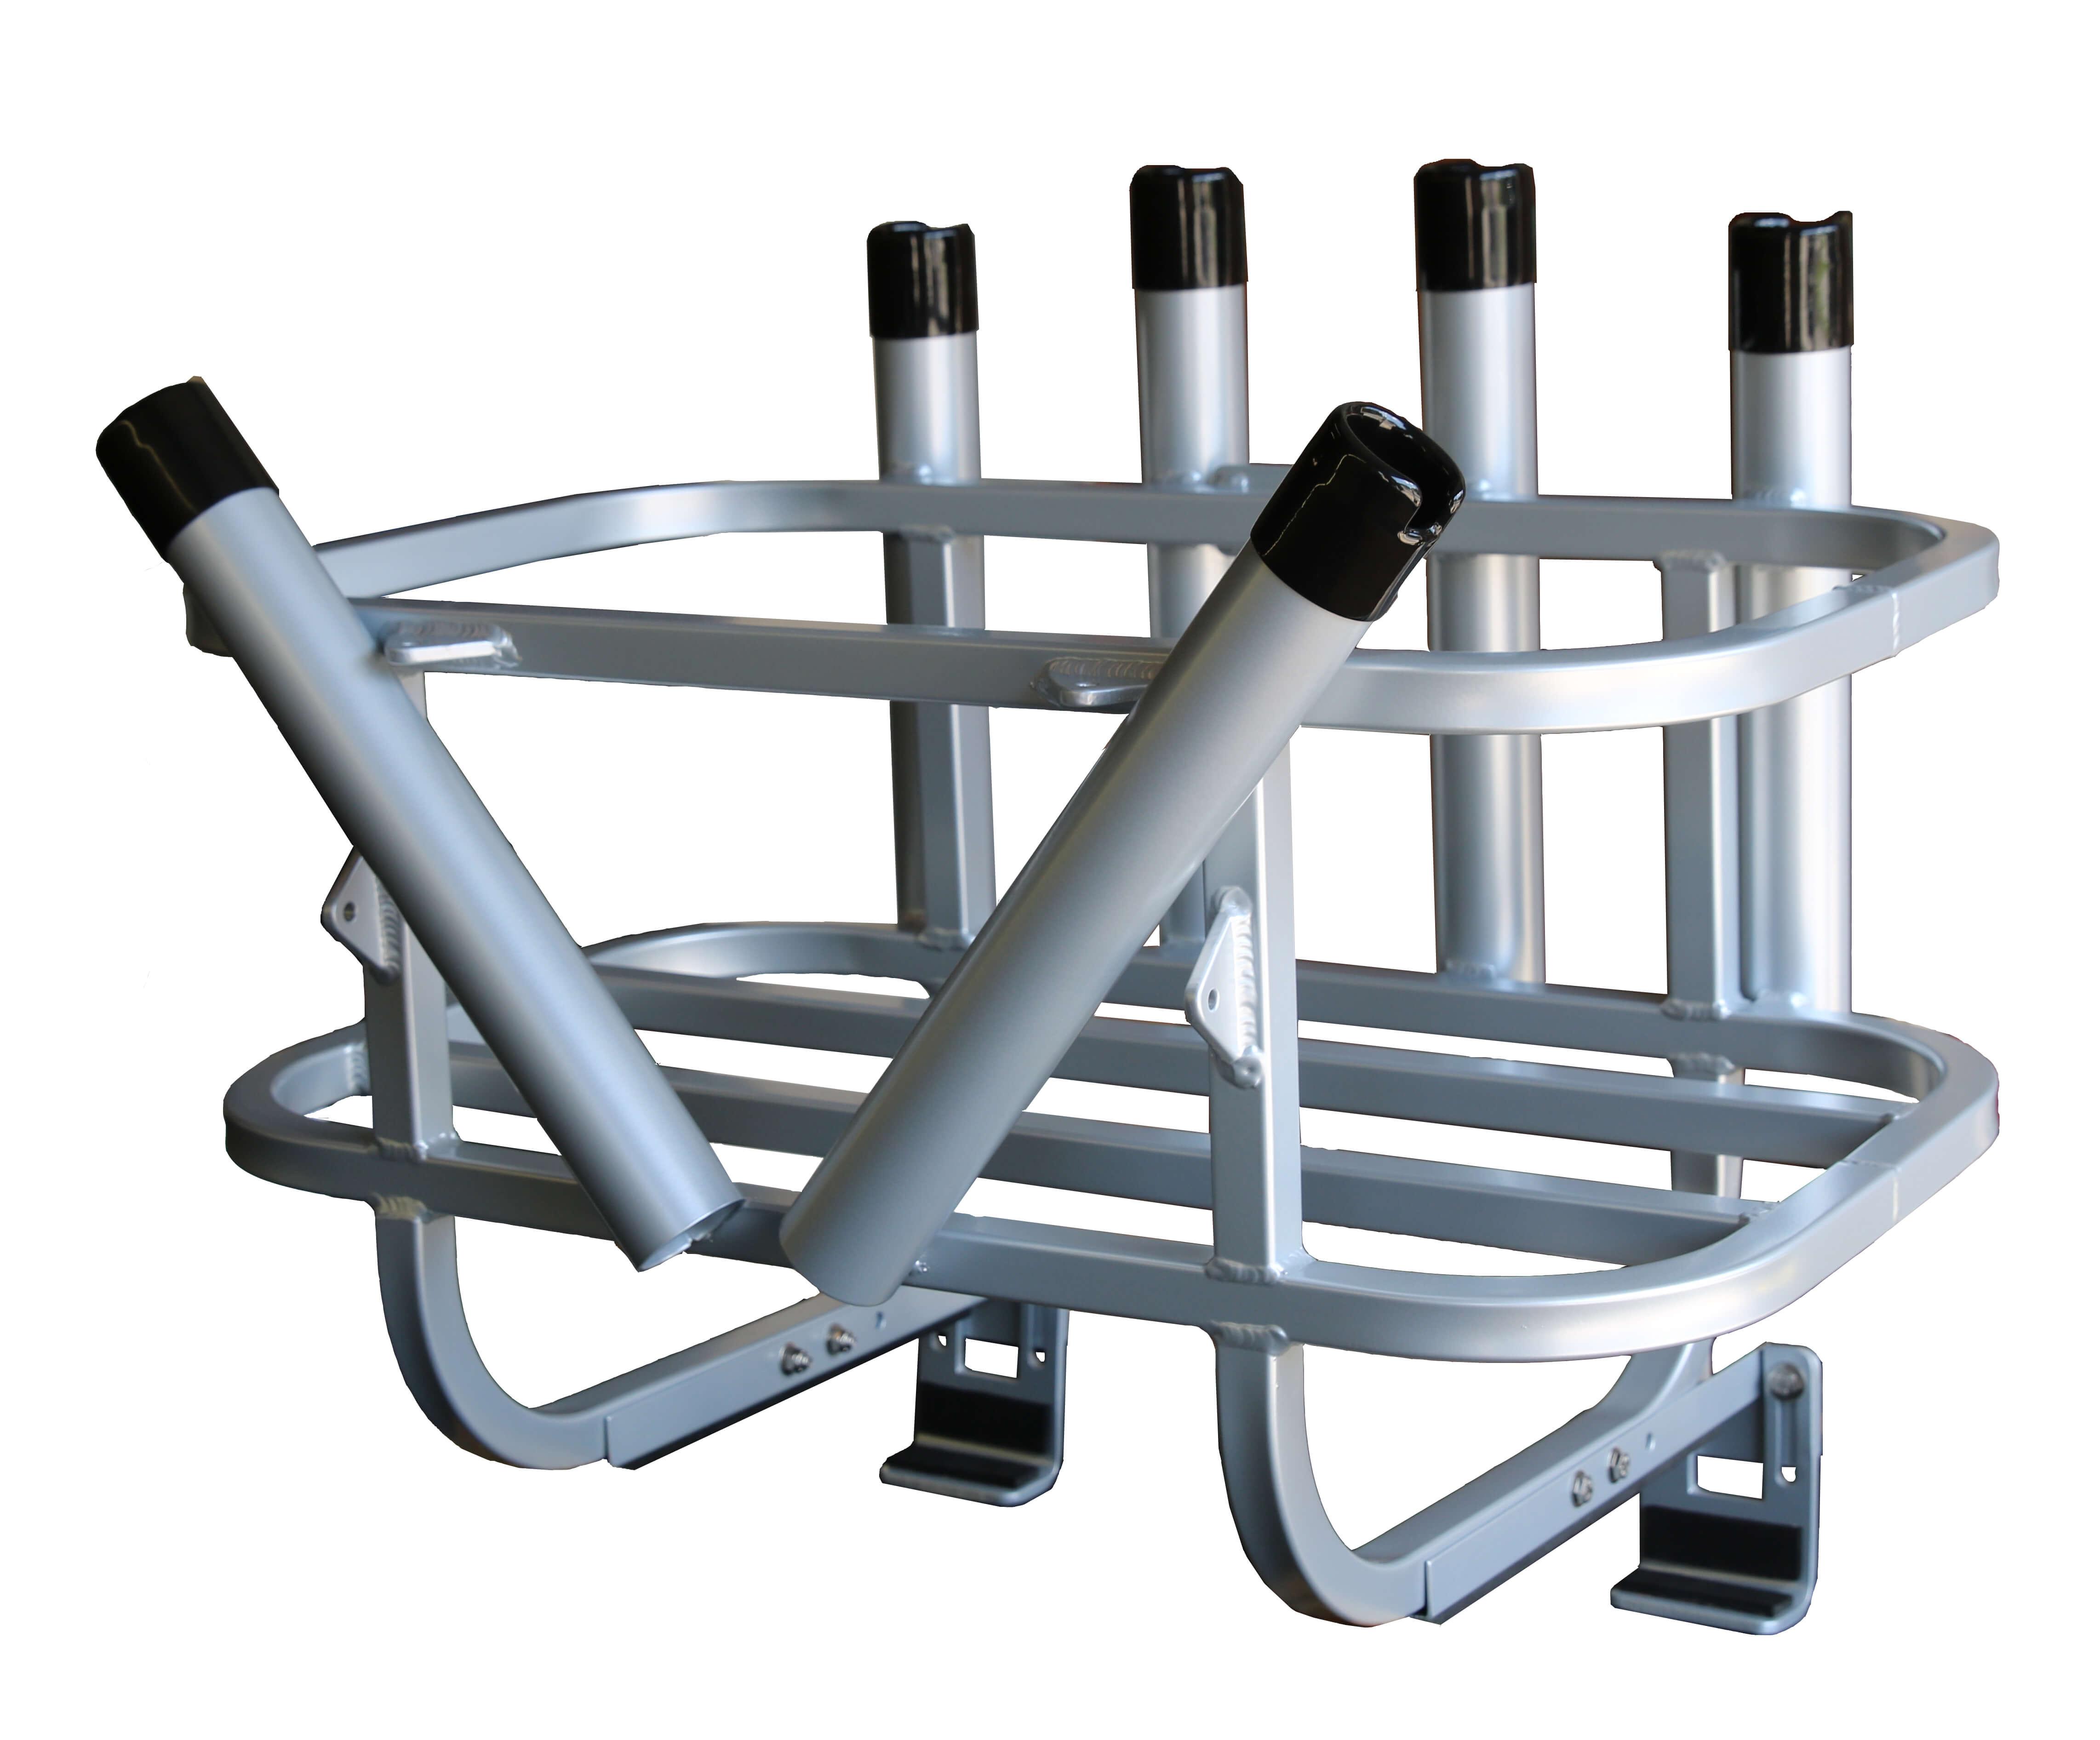 Jet ski rod rack cooler holder ski leg design plattinum for Jet ski fishing setup